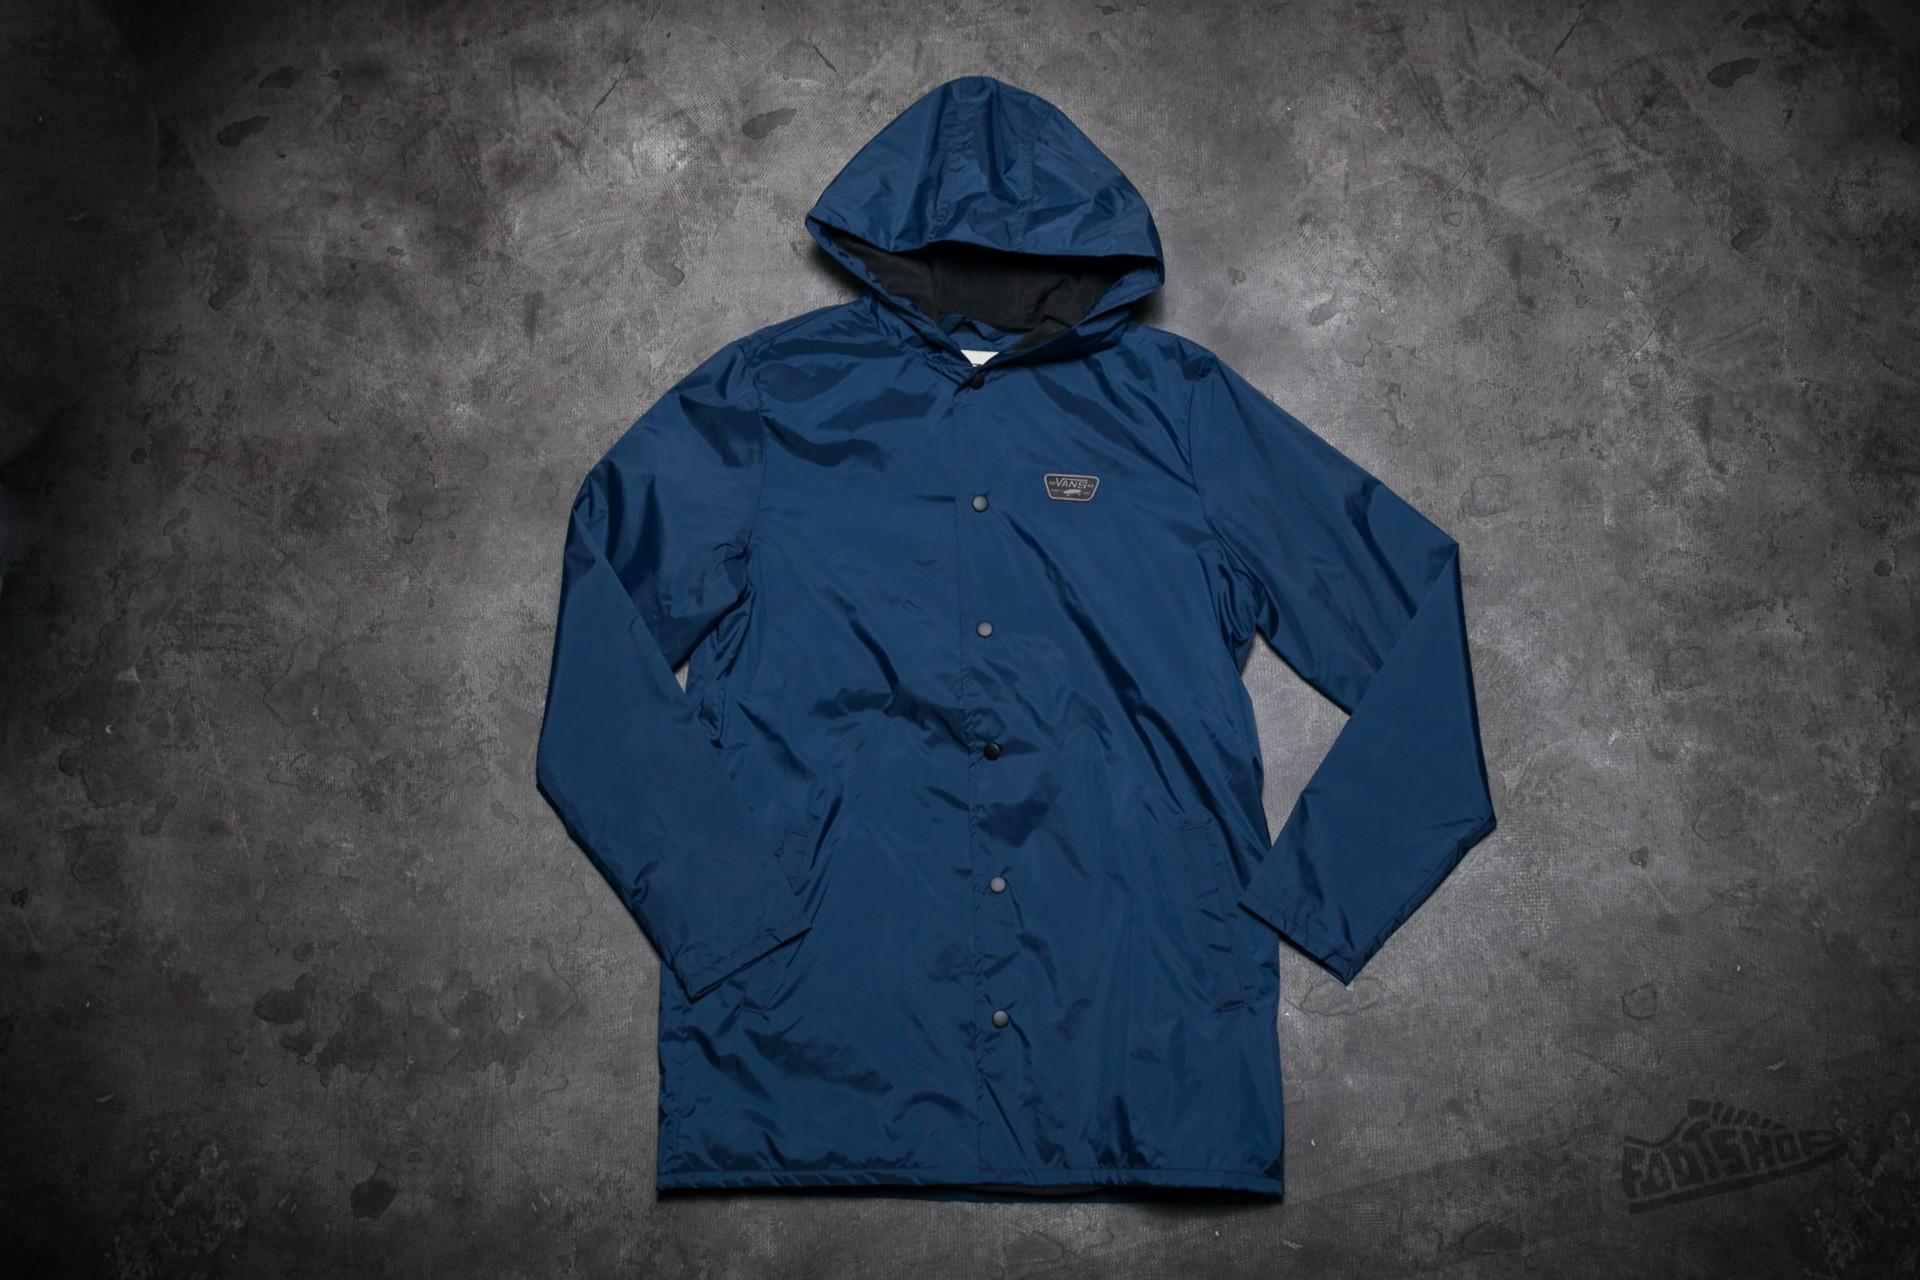 Vans Turnstall Parka Dress Blue